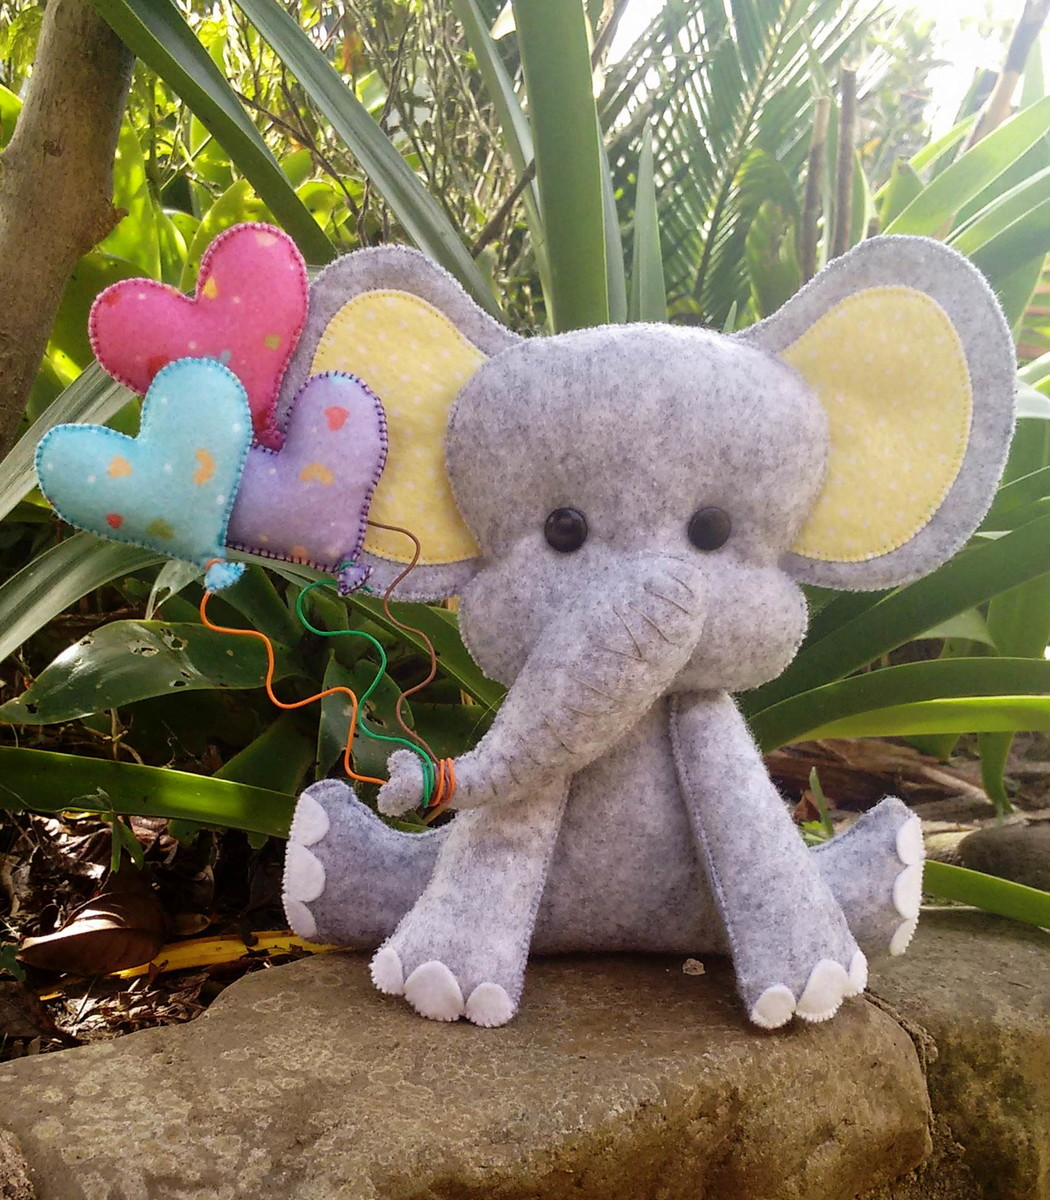 elefante fofinho no elo7 mamÃe ninja by mi pruss a2176d